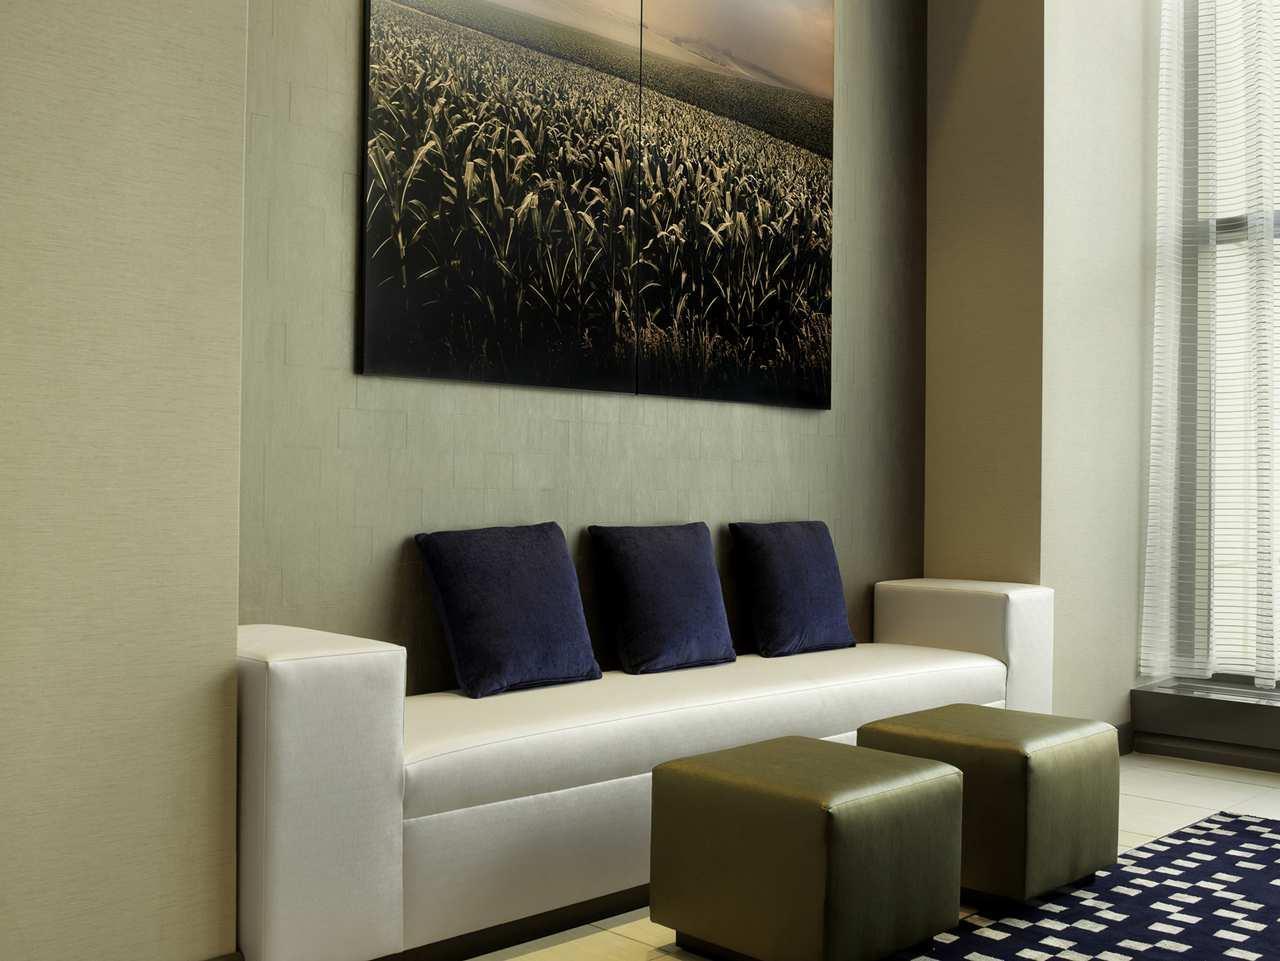 DoubleTree by Hilton Hotel Cedar Rapids Convention Complex image 1